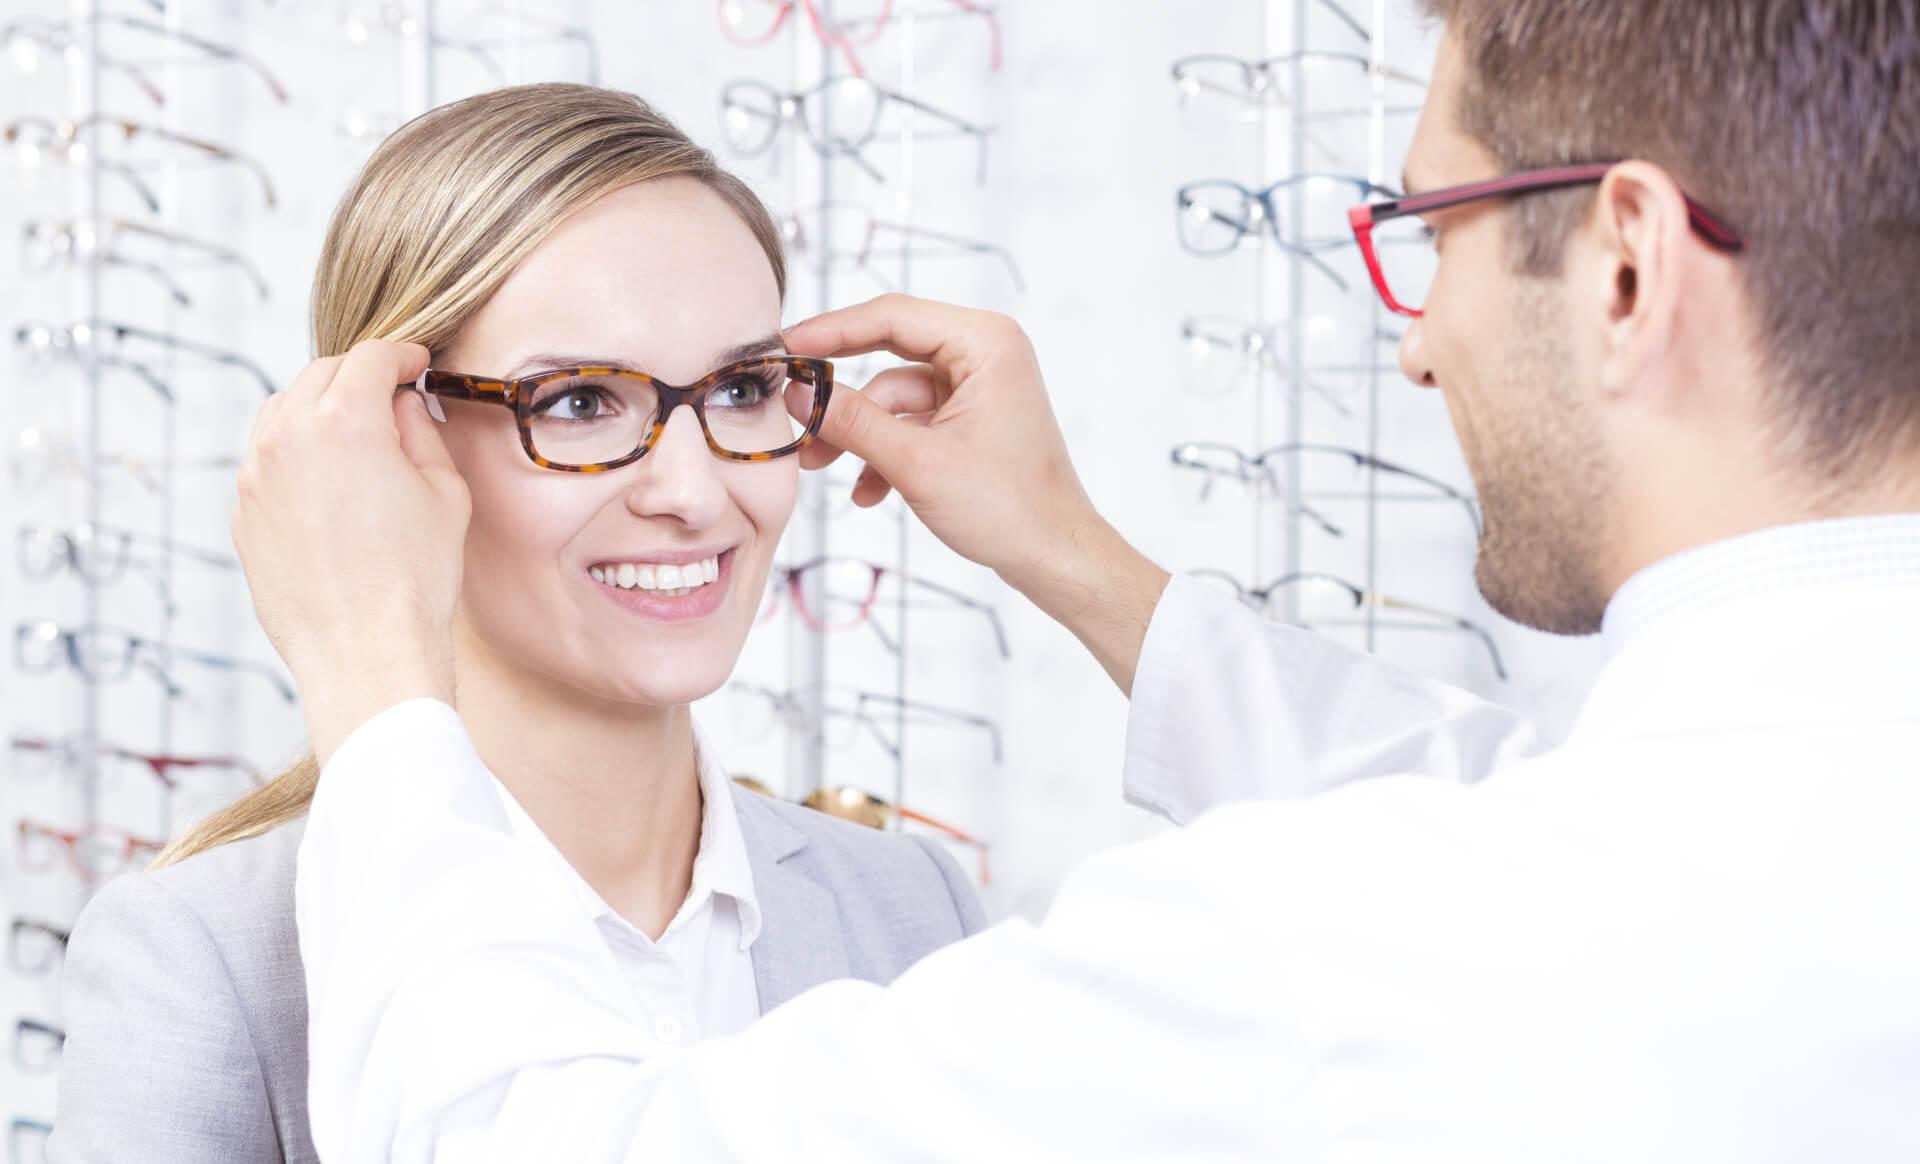 Brillengläser